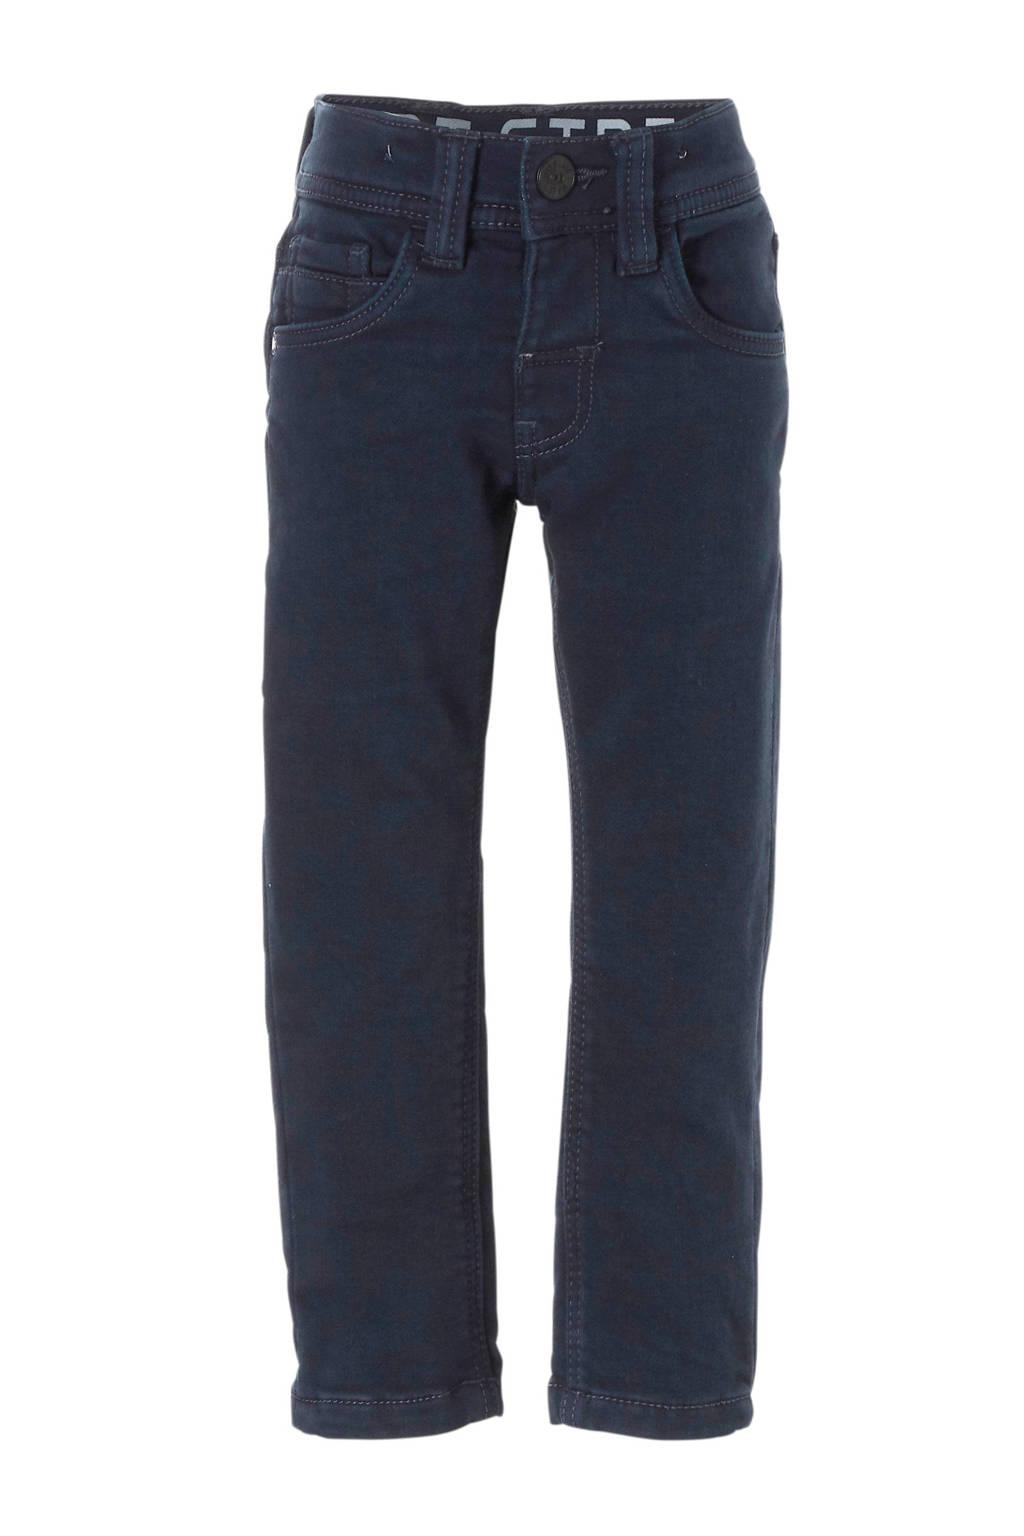 C&A Palomino slim fit thermo broek blauw, Donkerblauw